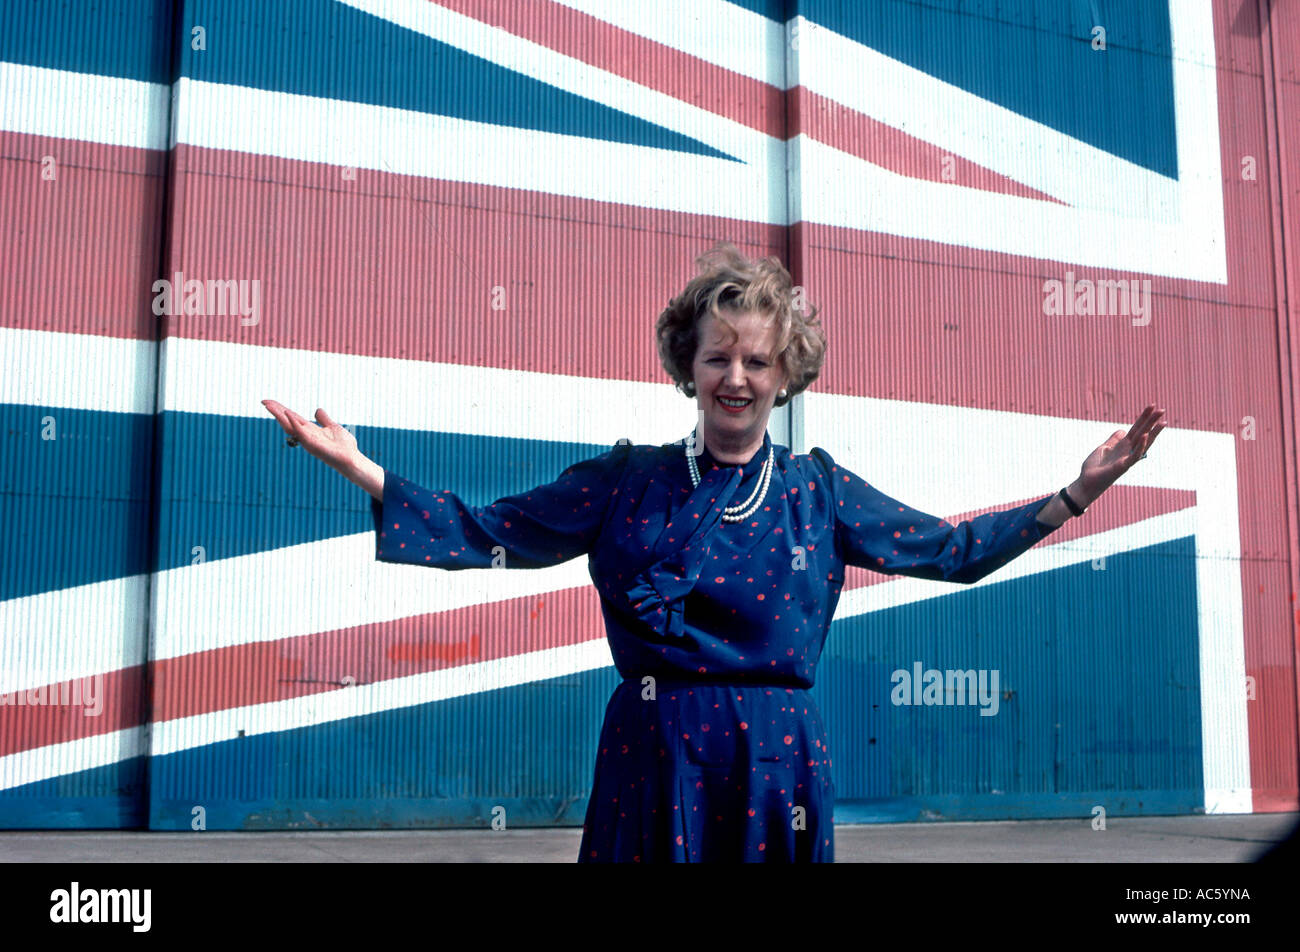 MARGARET THATCHER 1983 Campagna elettorale Immagini Stock